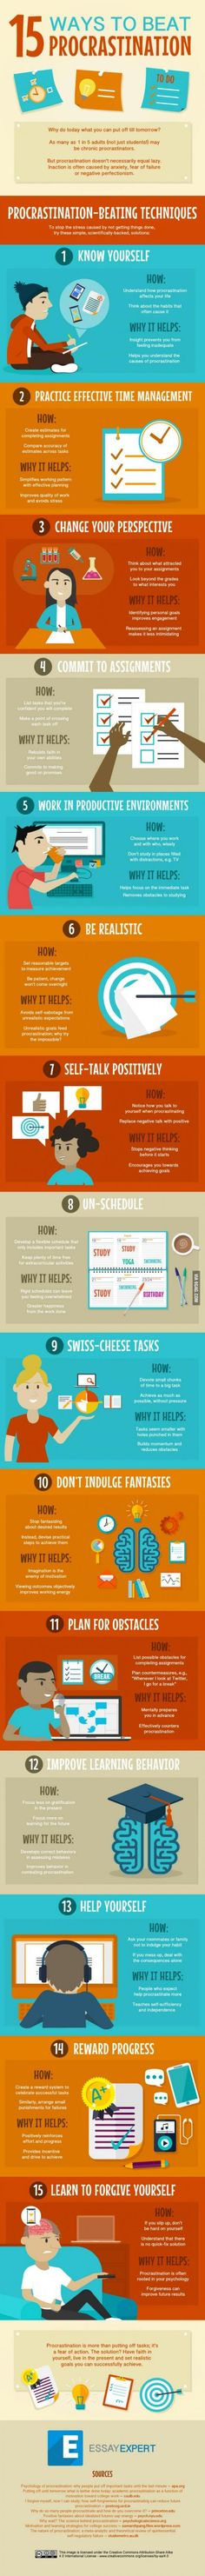 15 Ways to Overcome Procrastination   DailyFailCenter